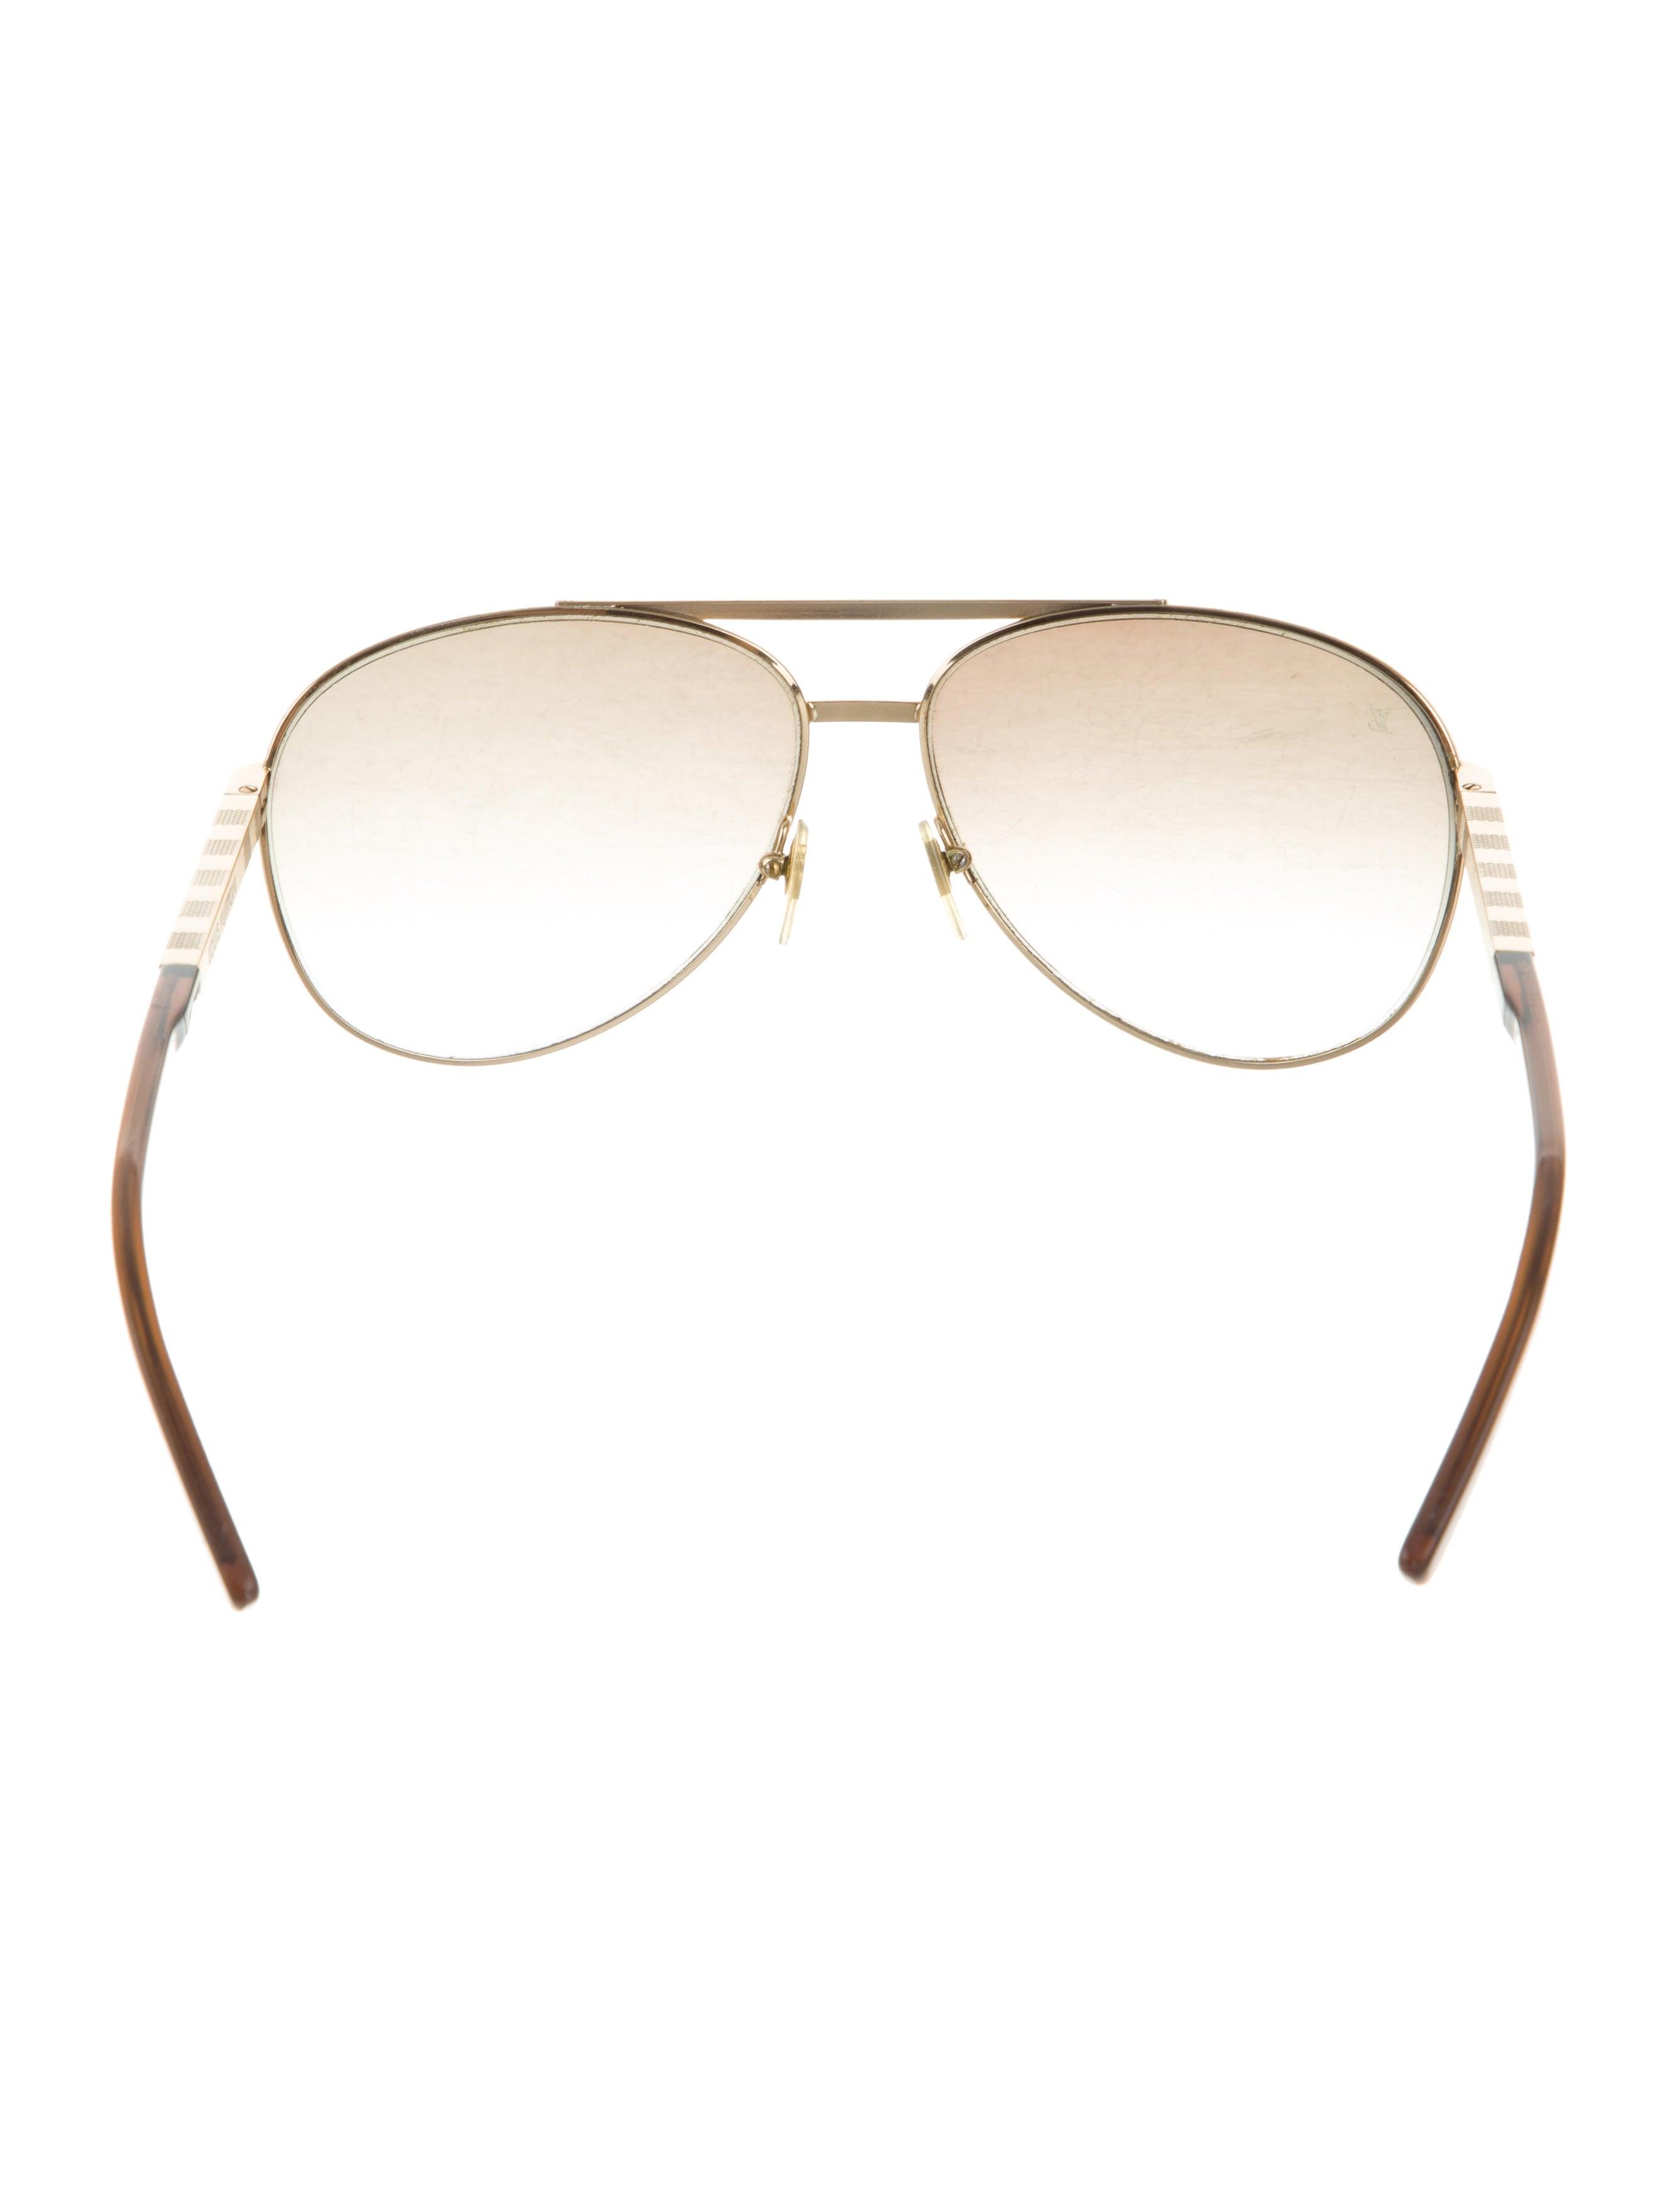 b9862cb5735 Louis Vuitton Attitude Sunglasses For Sale - Bitterroot Public Library